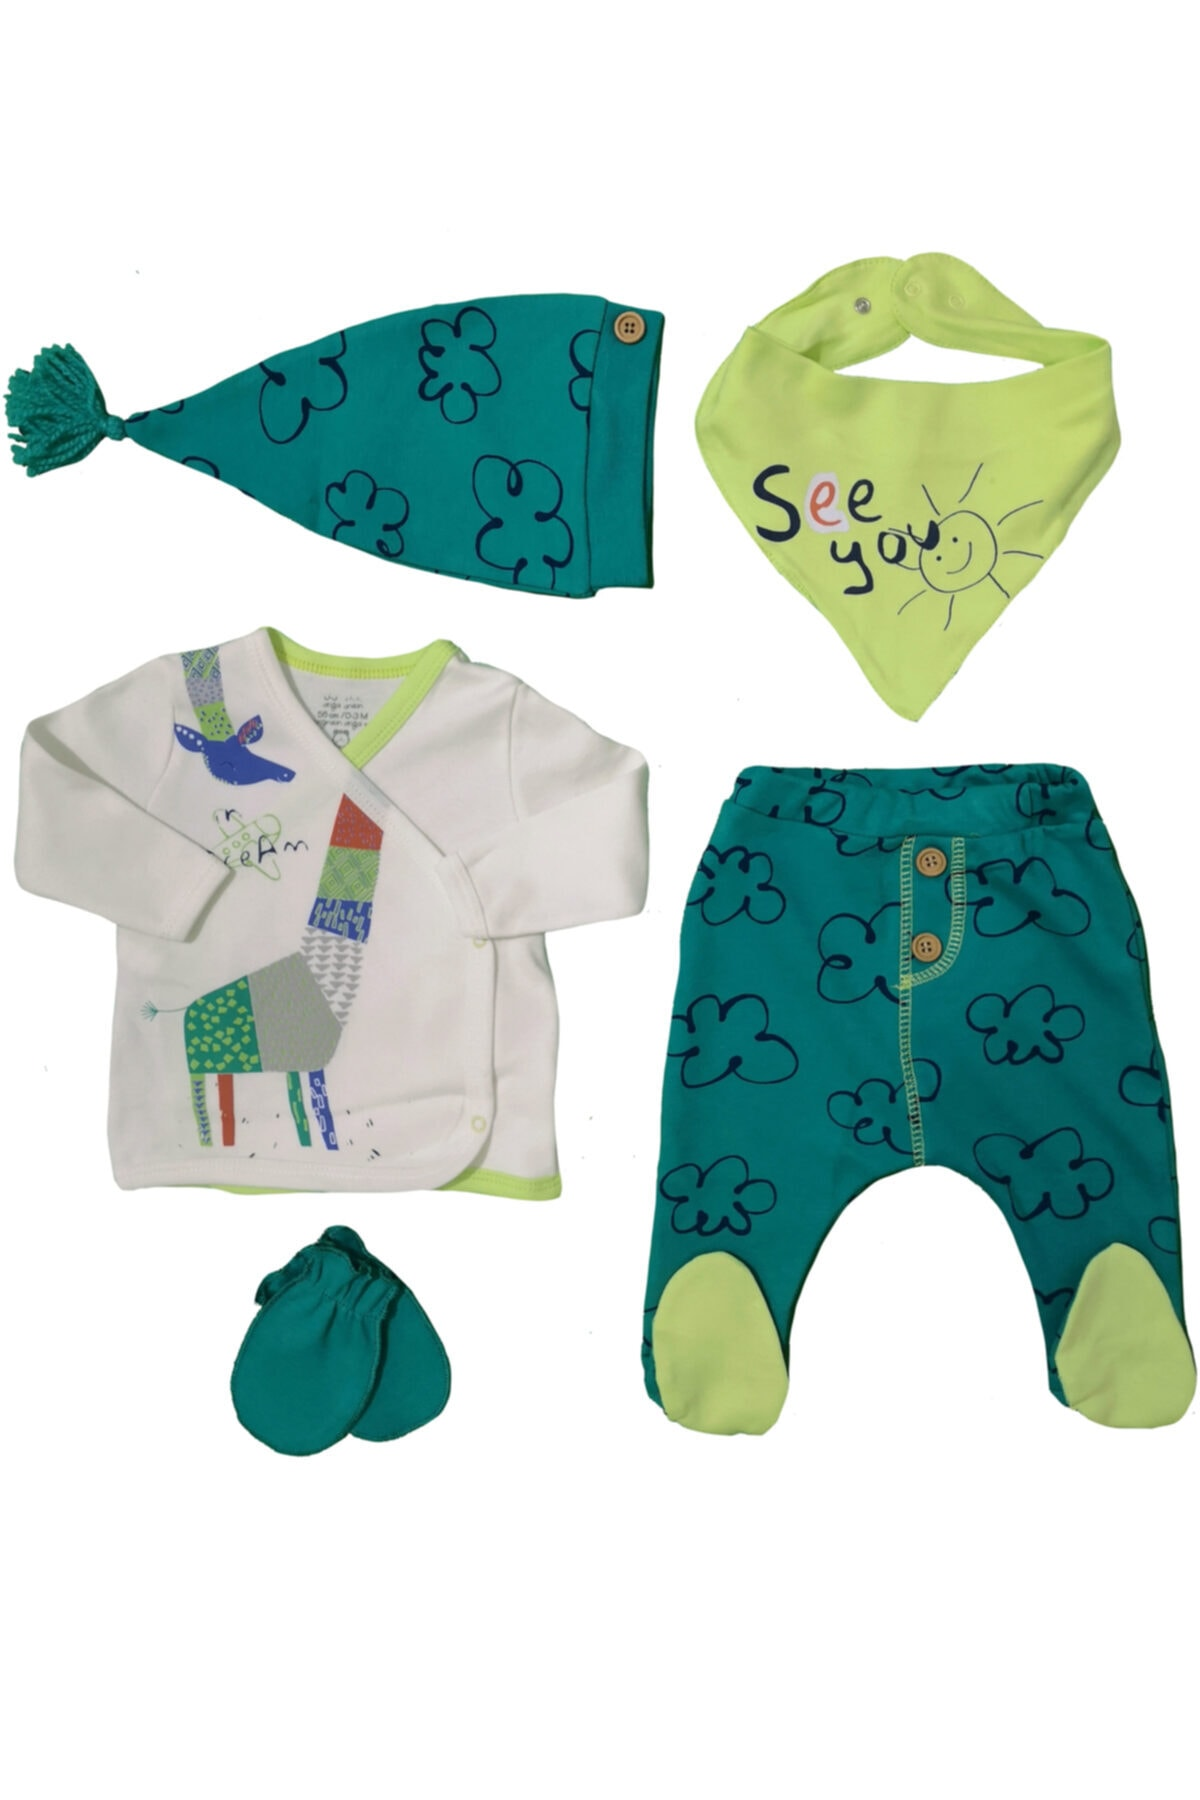 İmaj Erkek Bebek Yeşil See You Baskılı Hastane Çıkışı 5'li Set 1